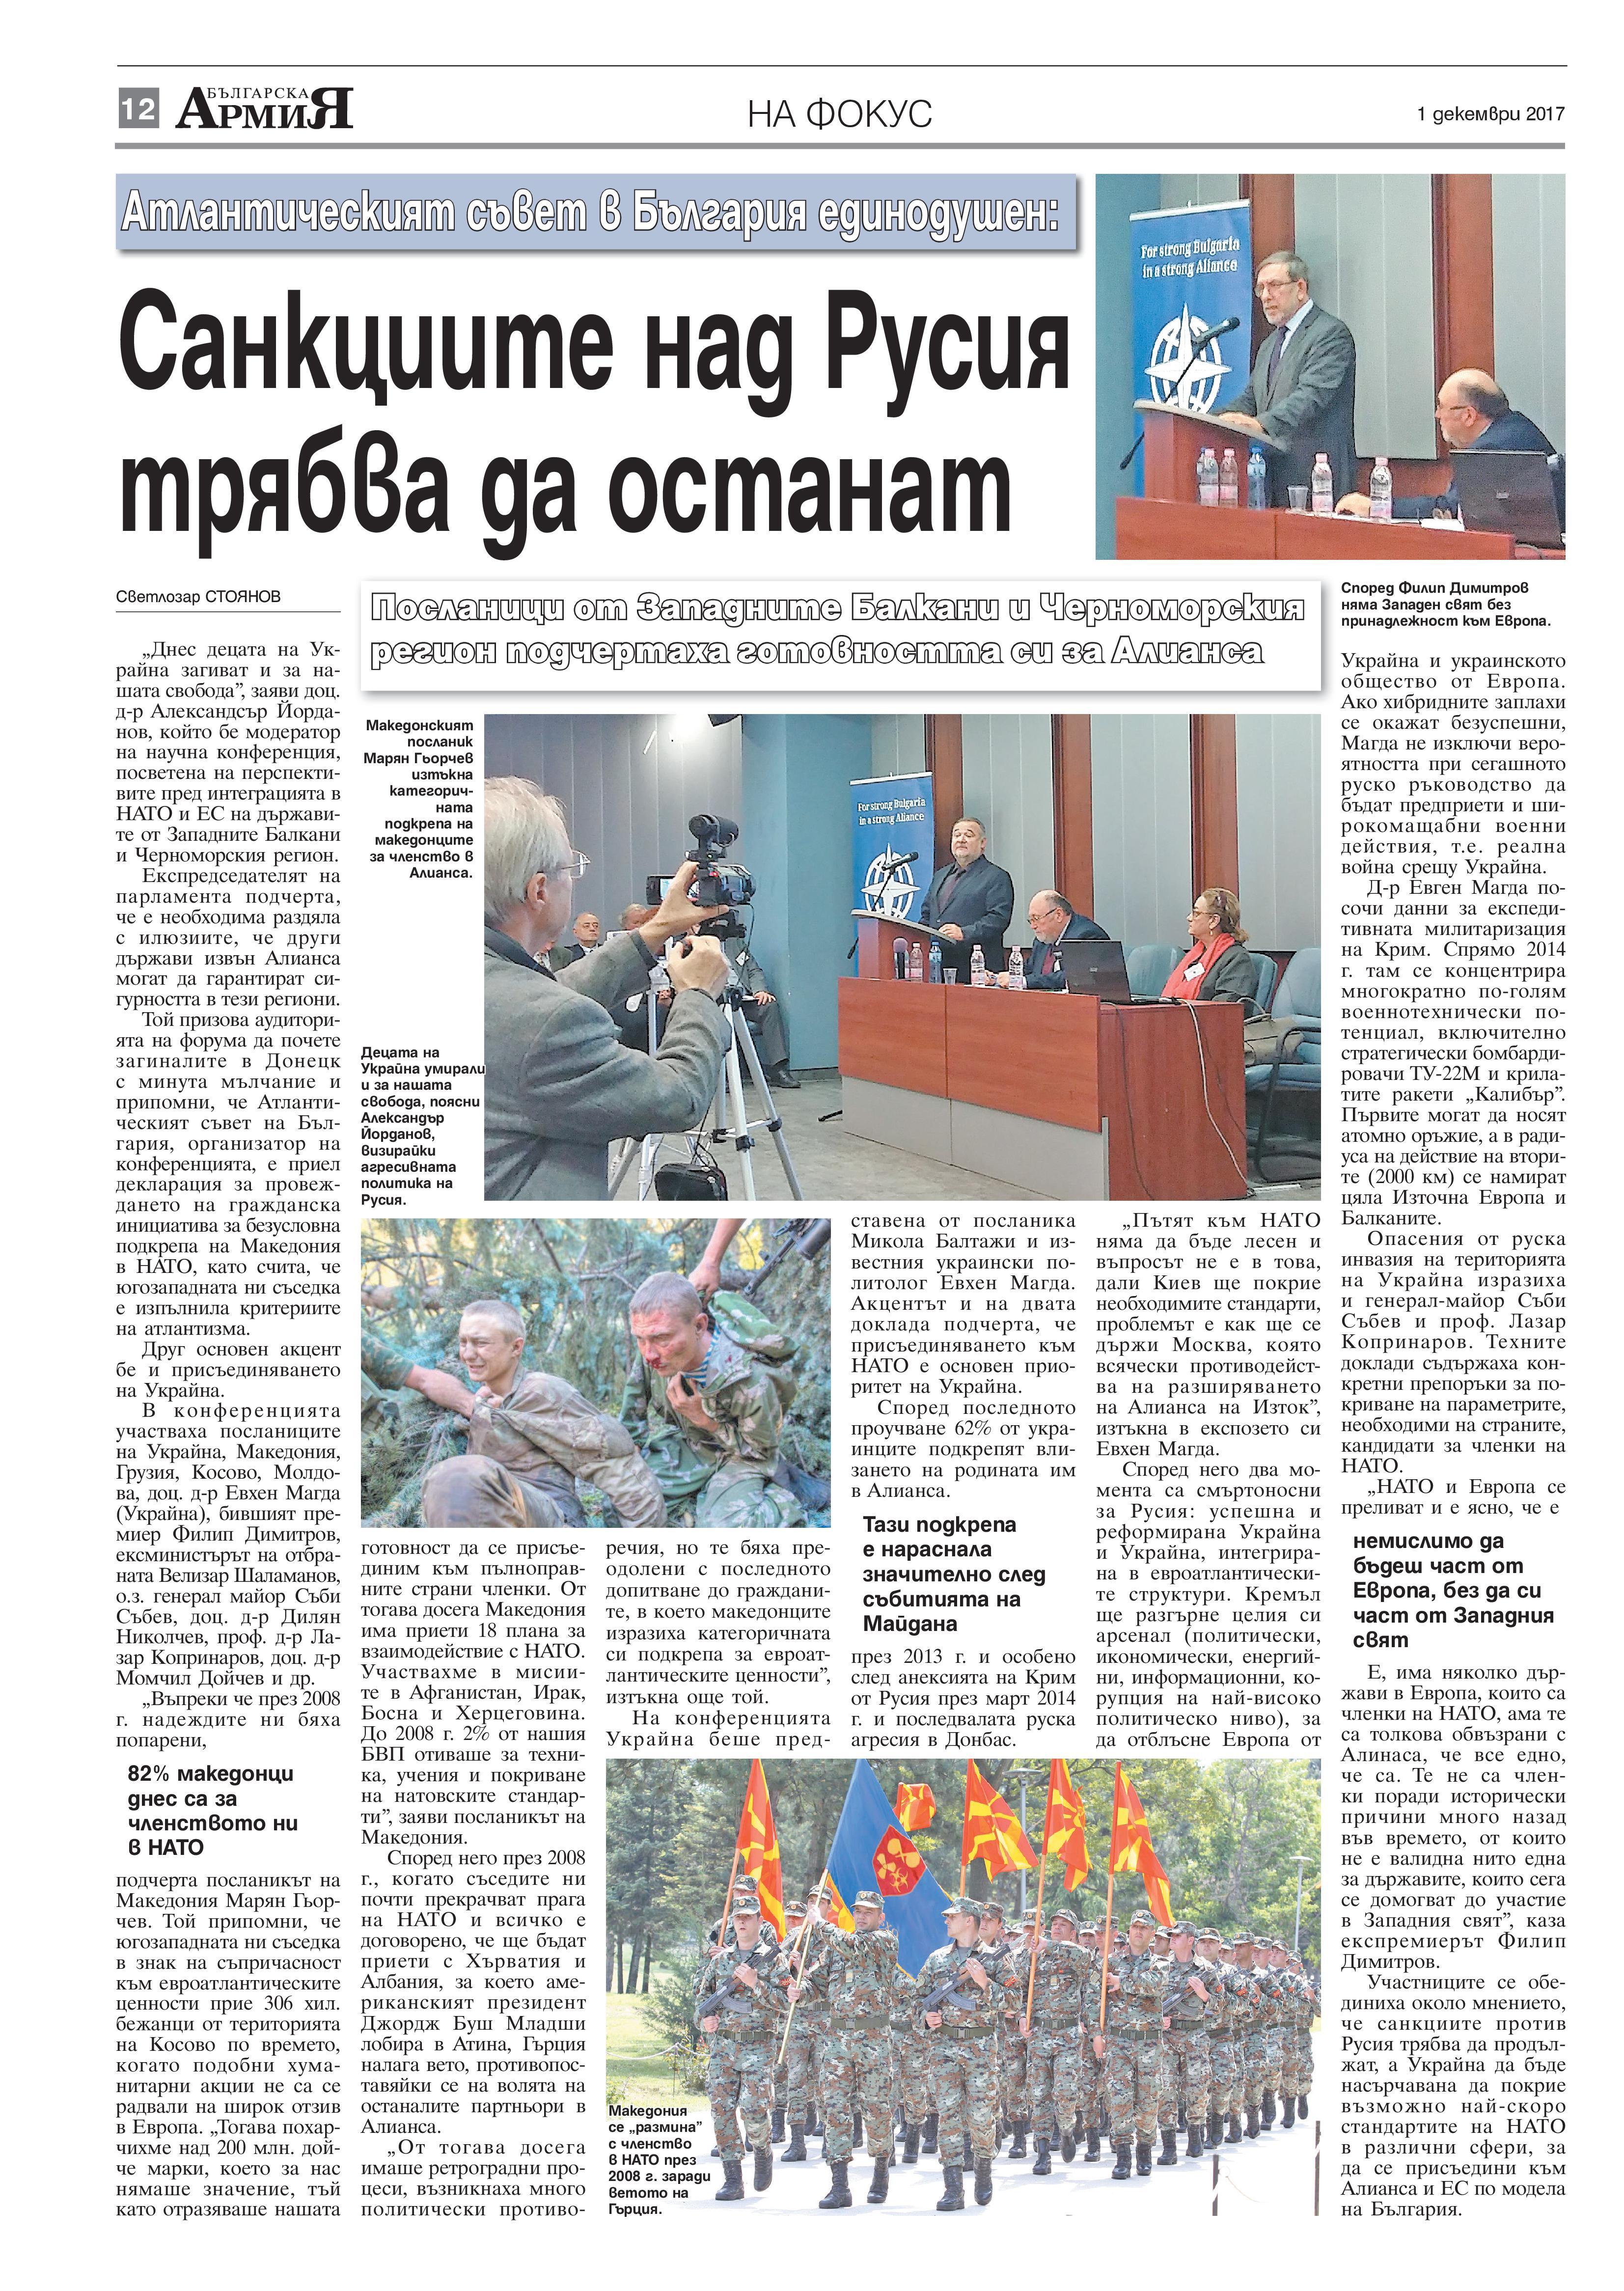 http://armymedia.bg/wp-content/uploads/2015/06/12-14.jpg